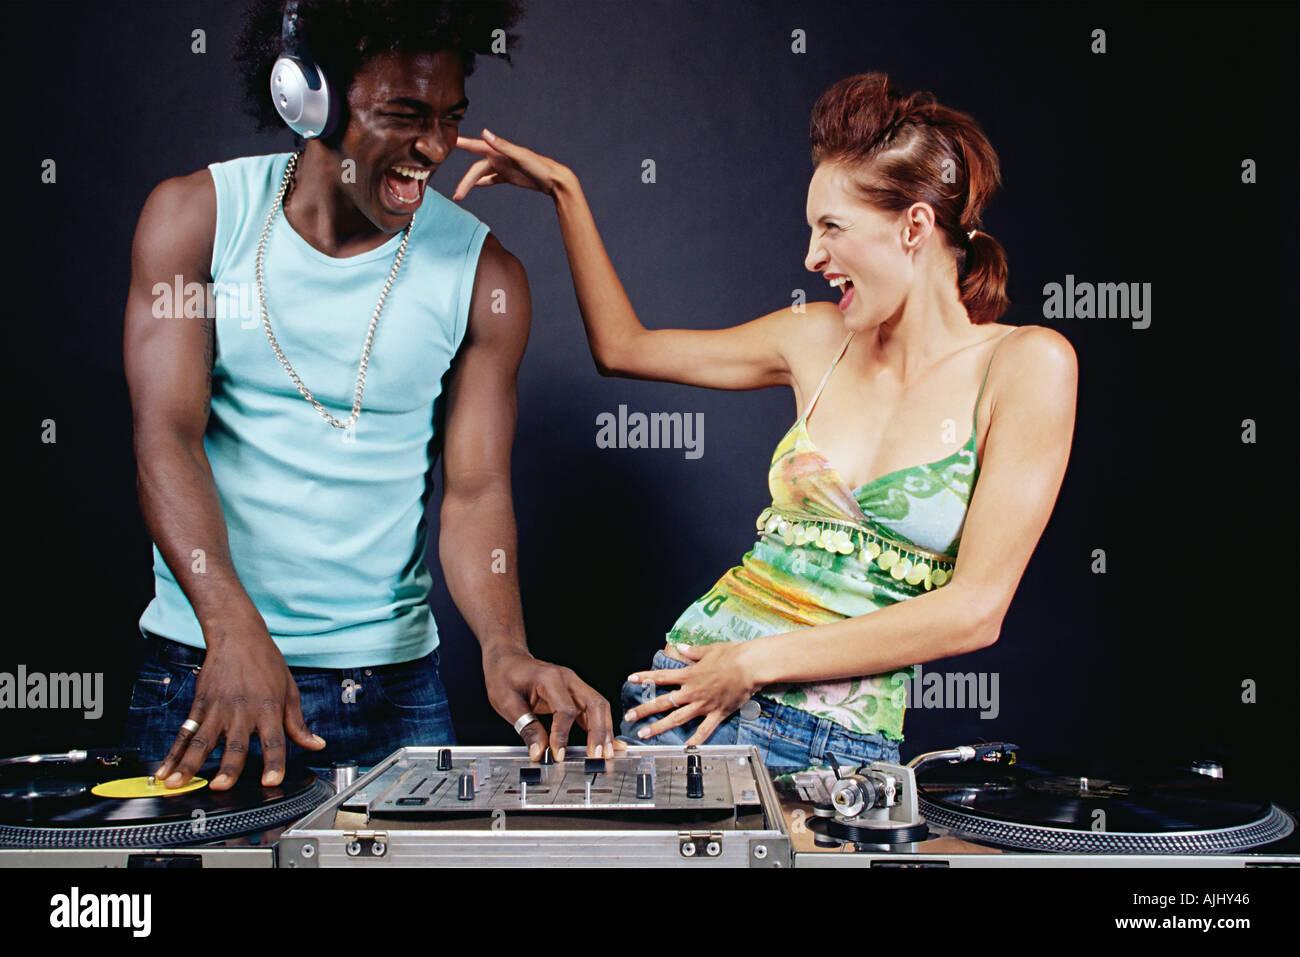 Friends DJing - Stock Image